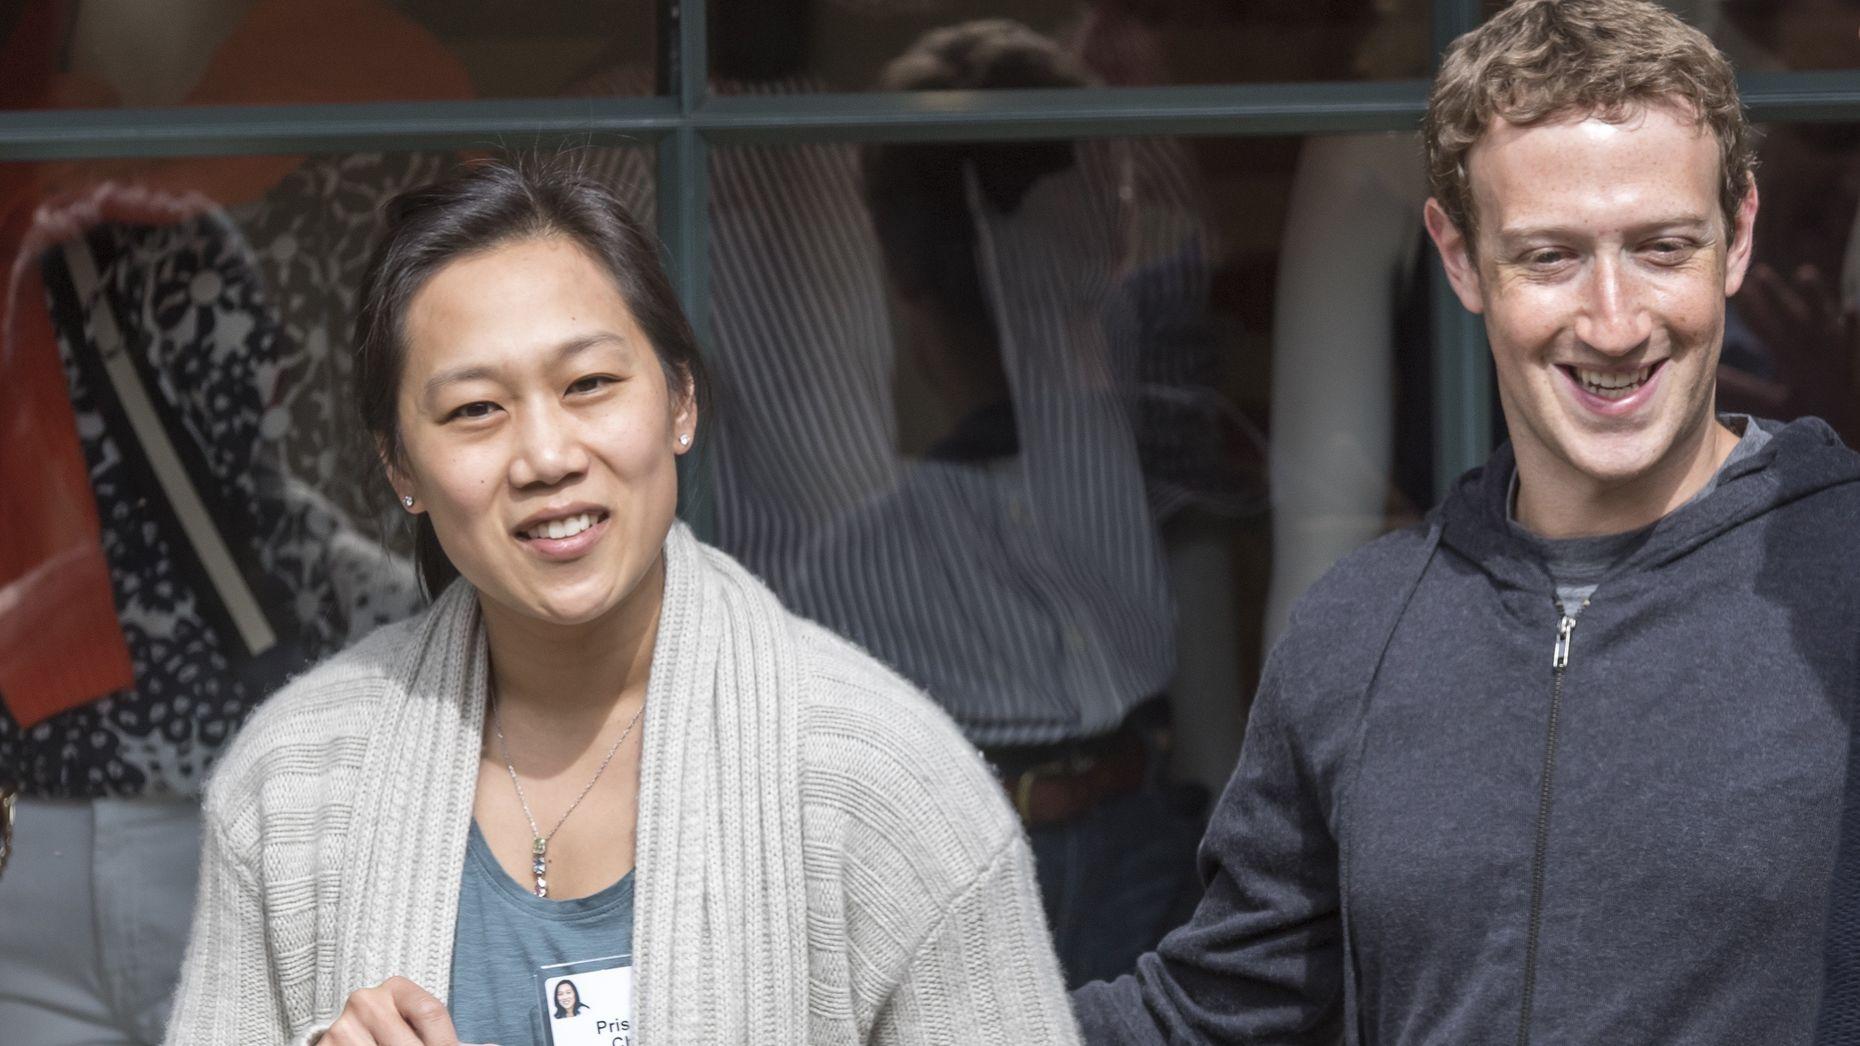 Chan Zuckerberg Initiative principals Priscilla Chan and Mark Zuckerberg. Photo by Bloomberg.